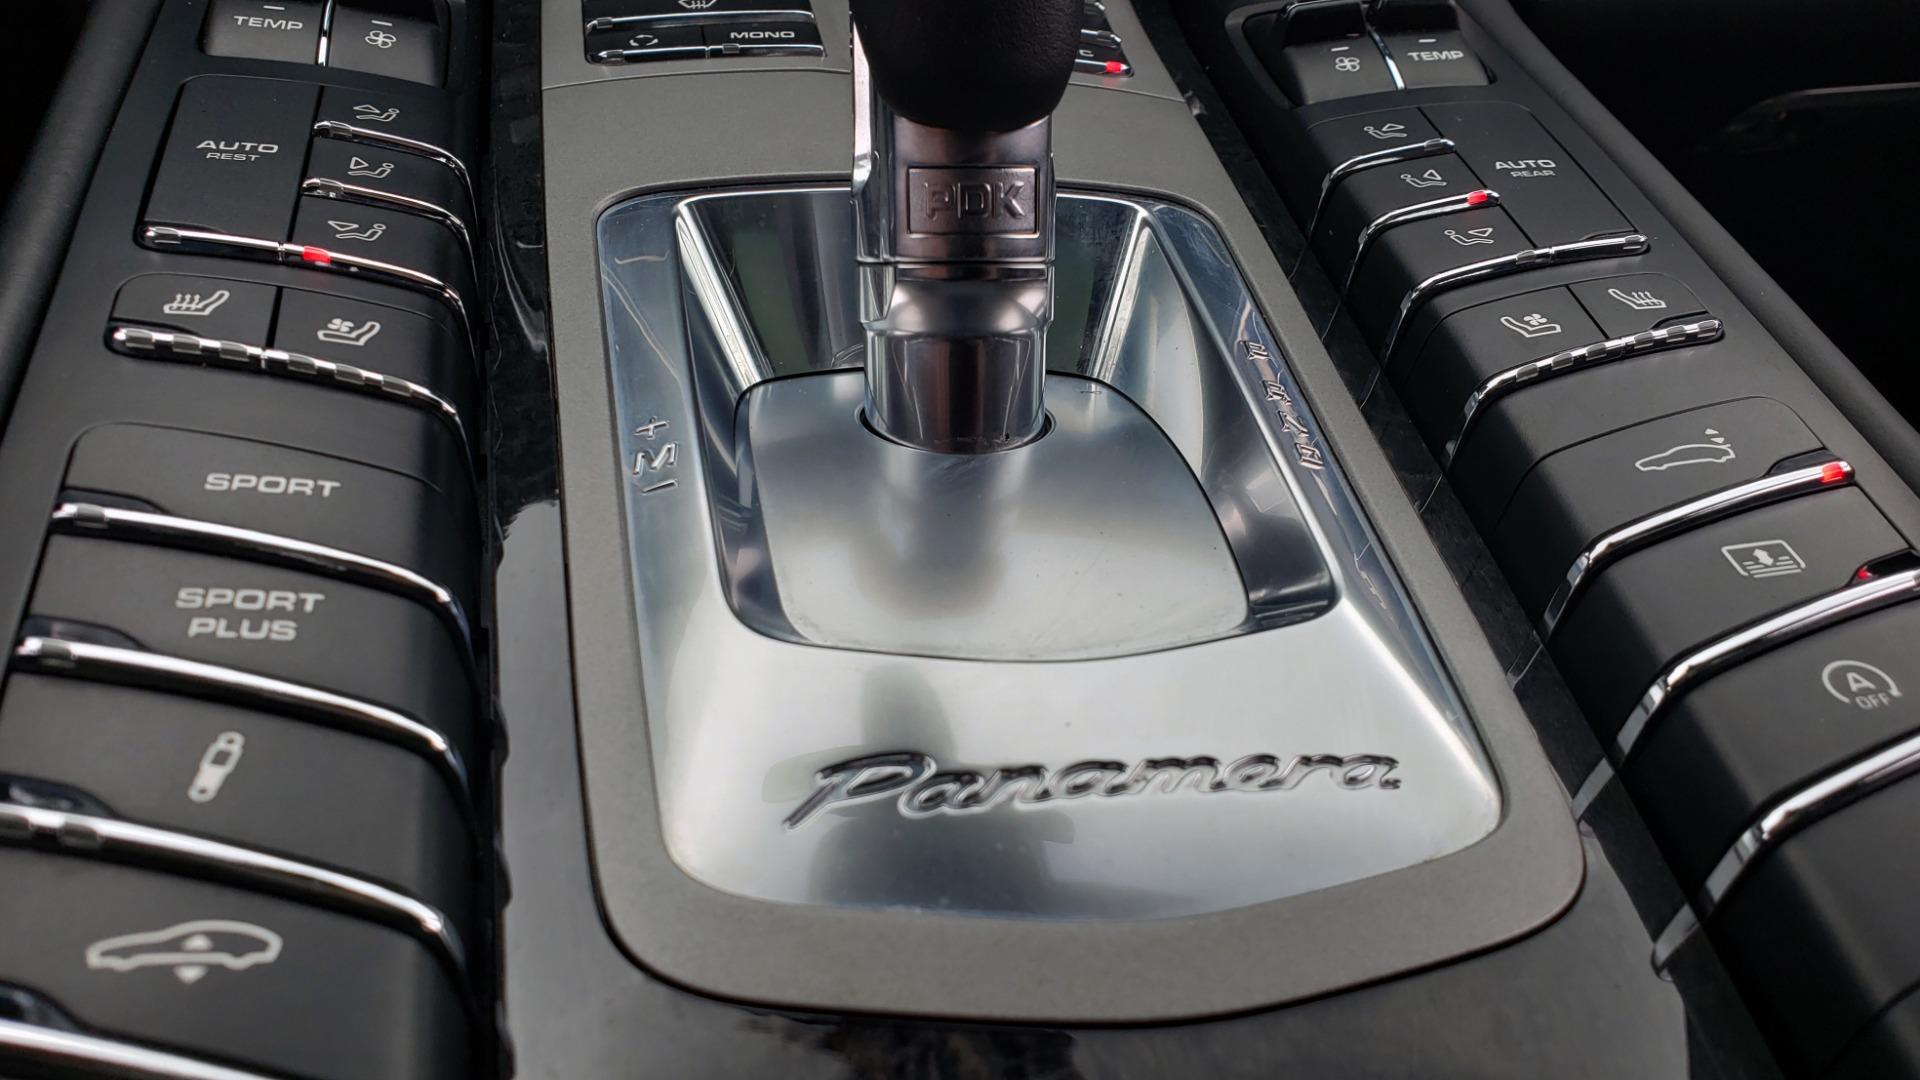 Used 2013 Porsche PANAMERA TURBO 4.8L V8 / AWD / NAV / SUNROOF / LCA / PARK ASST / BURMESTER for sale $45,995 at Formula Imports in Charlotte NC 28227 51